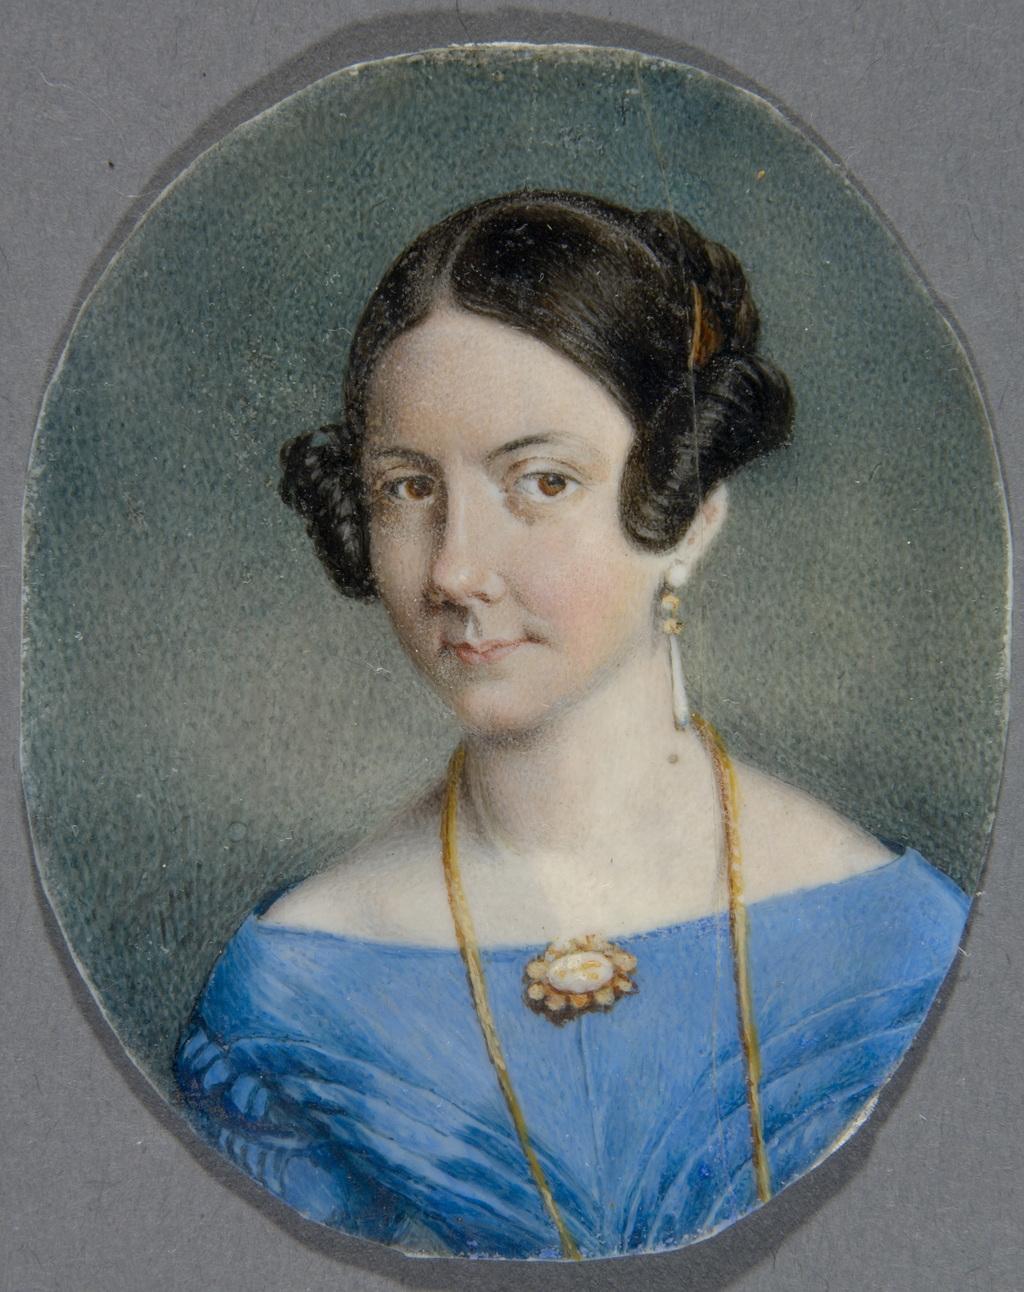 Madame Narcisse-Fortunat Belleau, née Marie-Reine Josephte Gauvreau